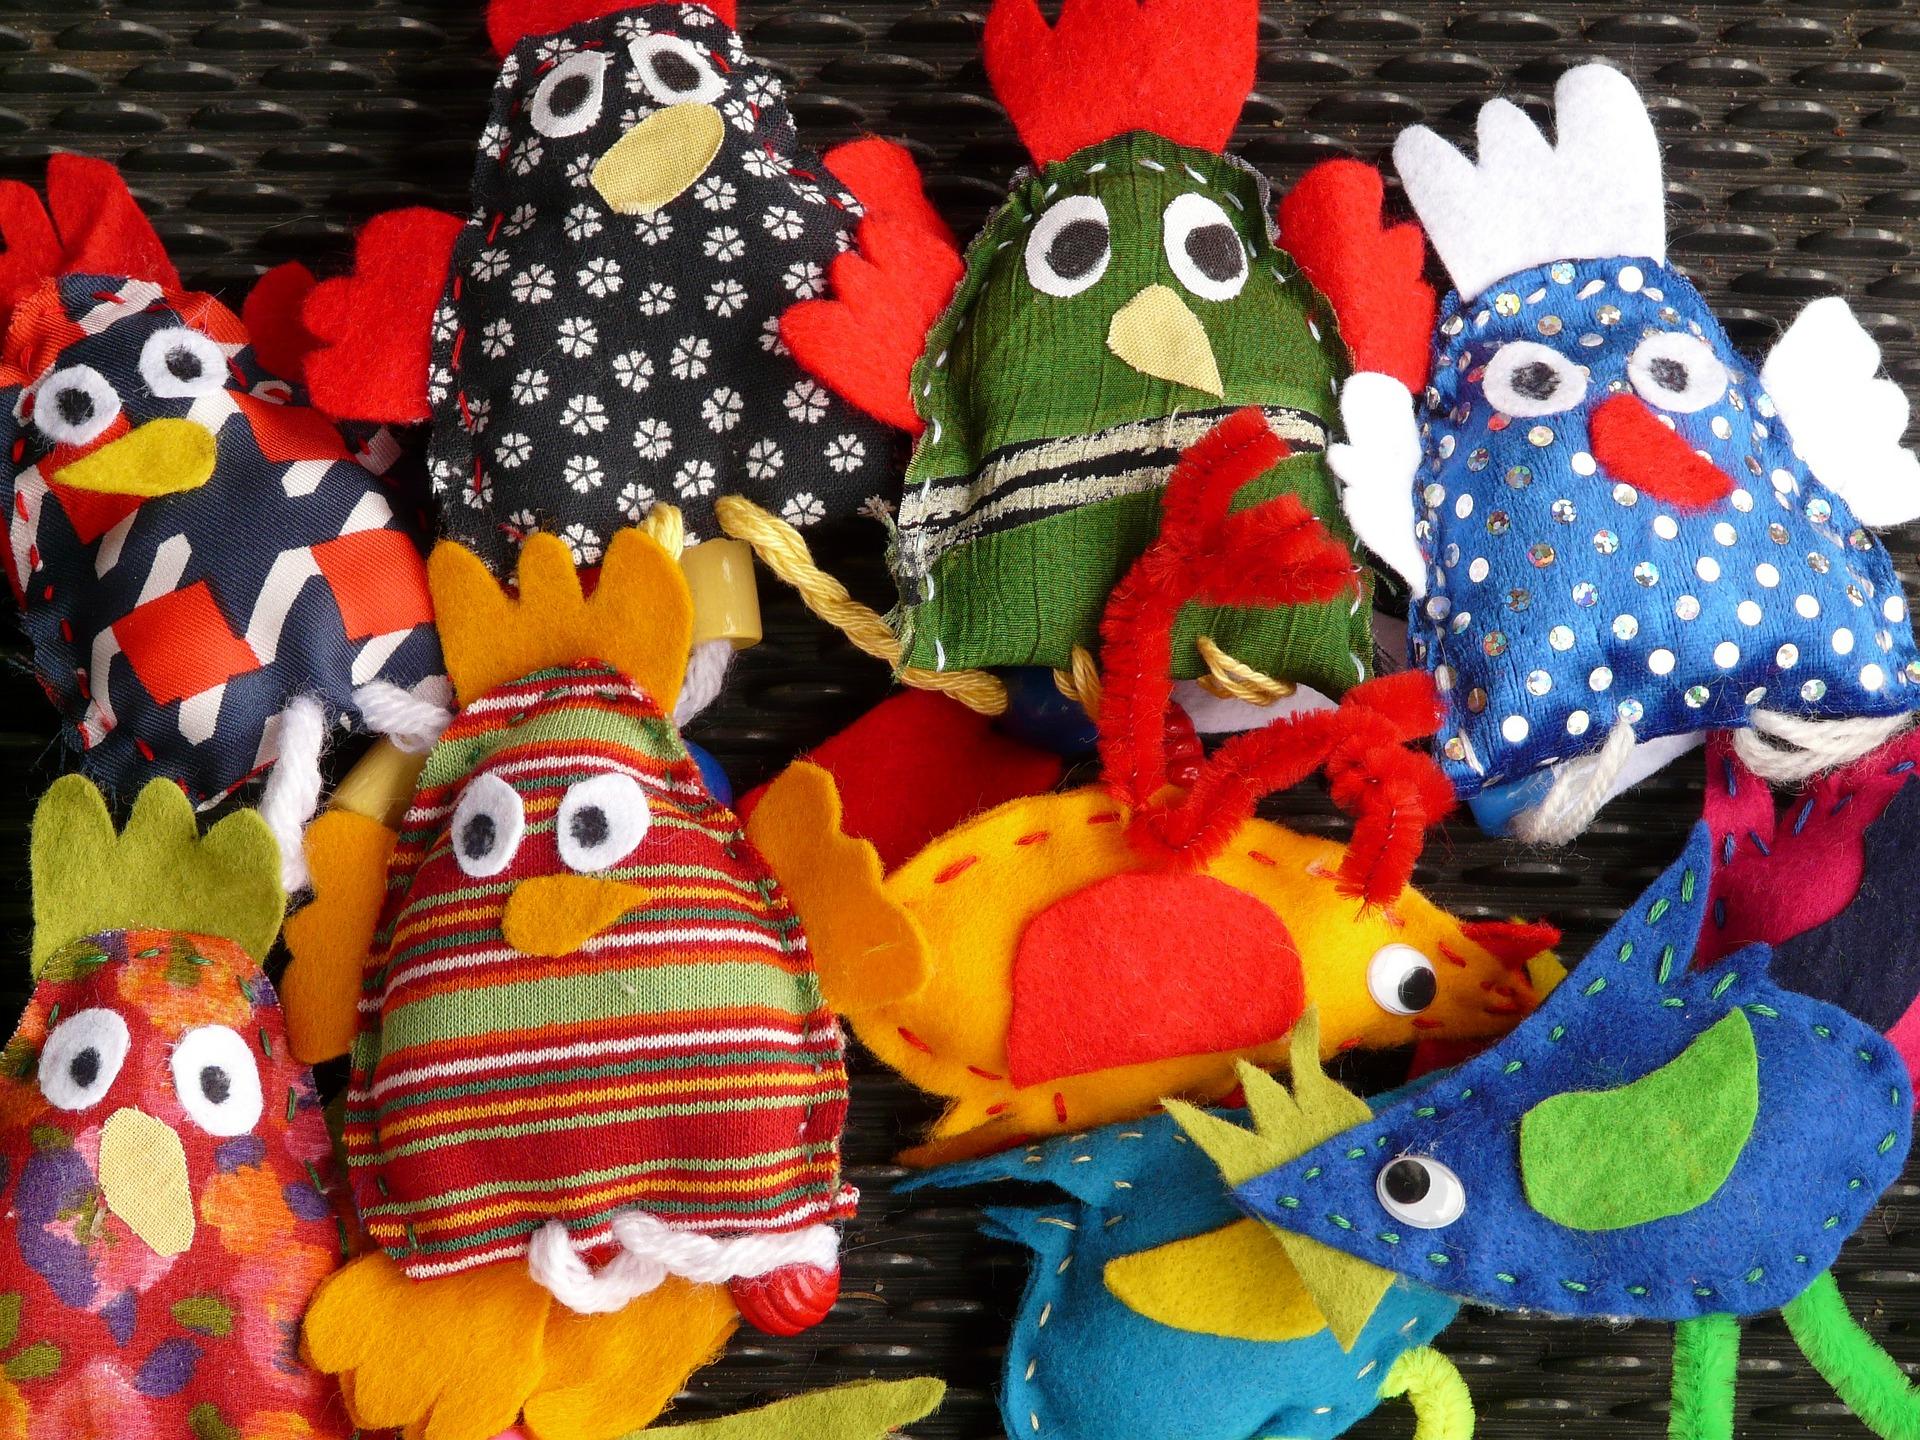 finger-puppets-49651_1920